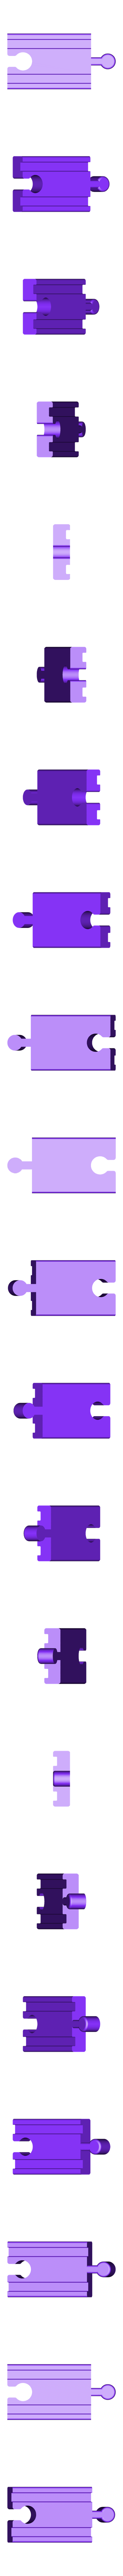 Straight Short Track.stl Download free STL file Toy Train Tracks • 3D printer design, FerryTeacher